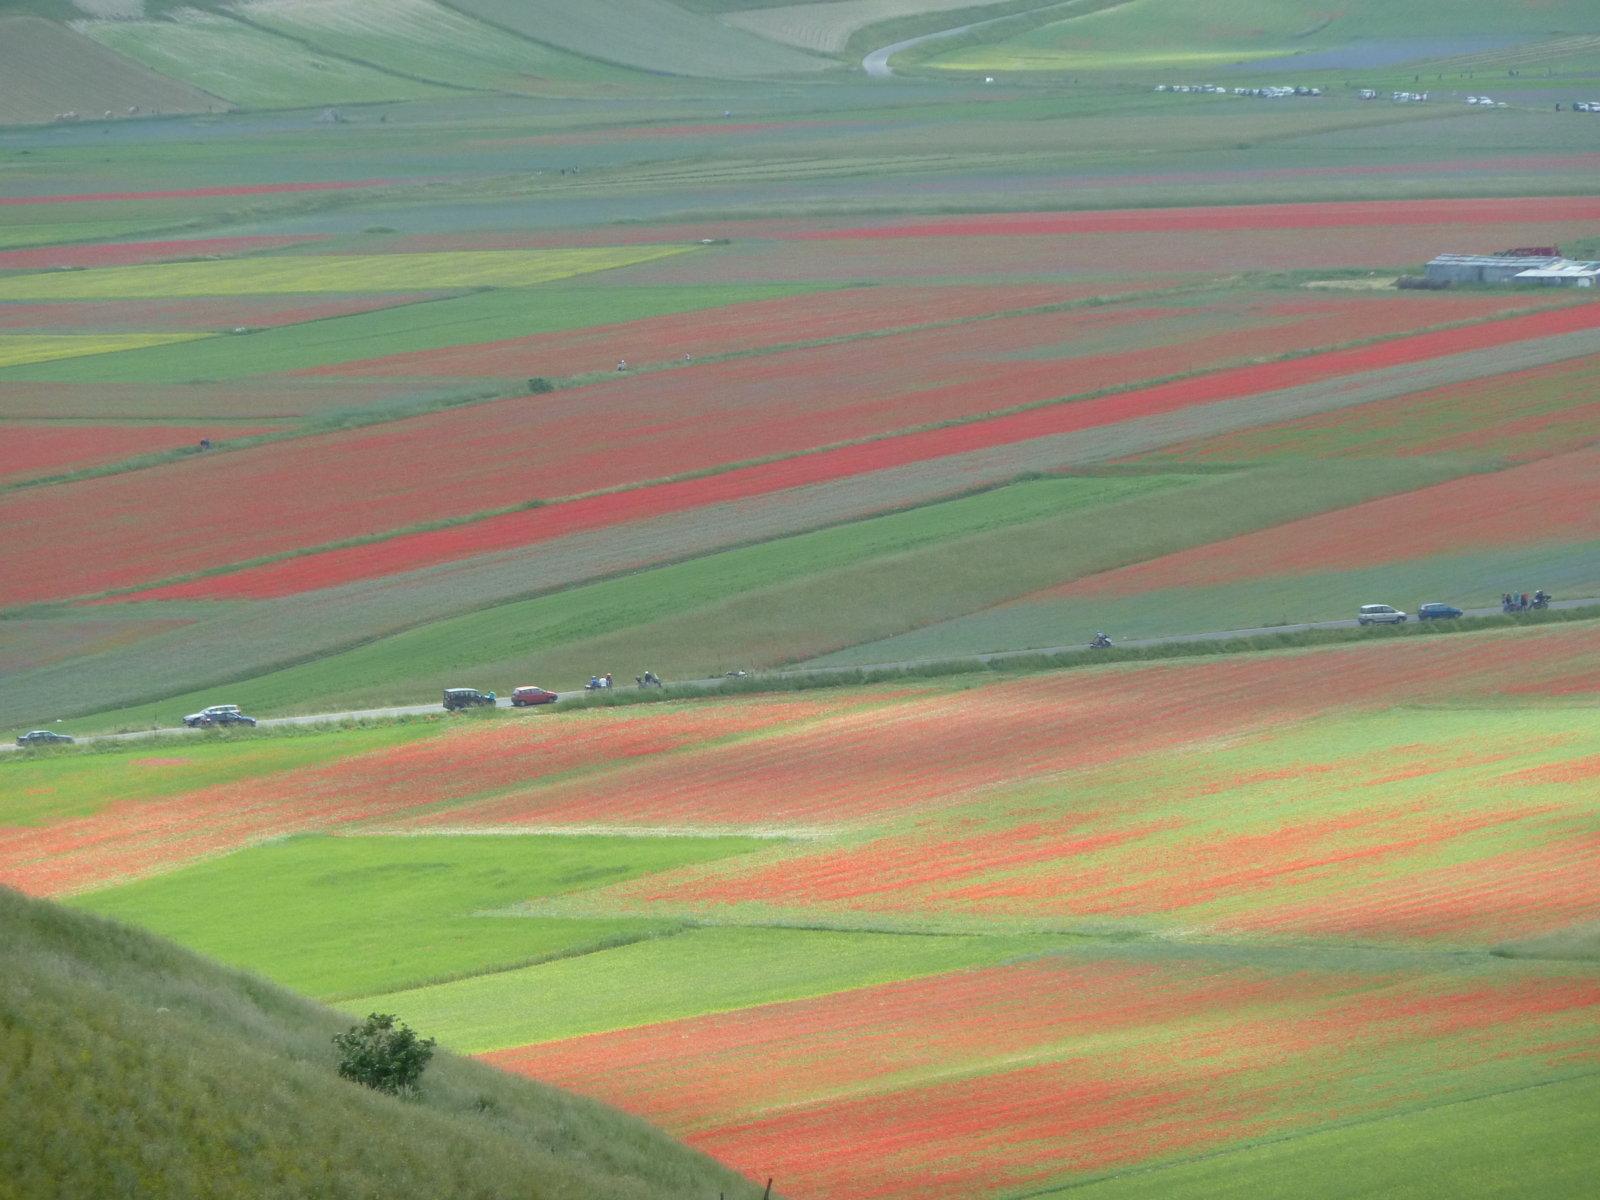 rosso-verde-fileminimizer